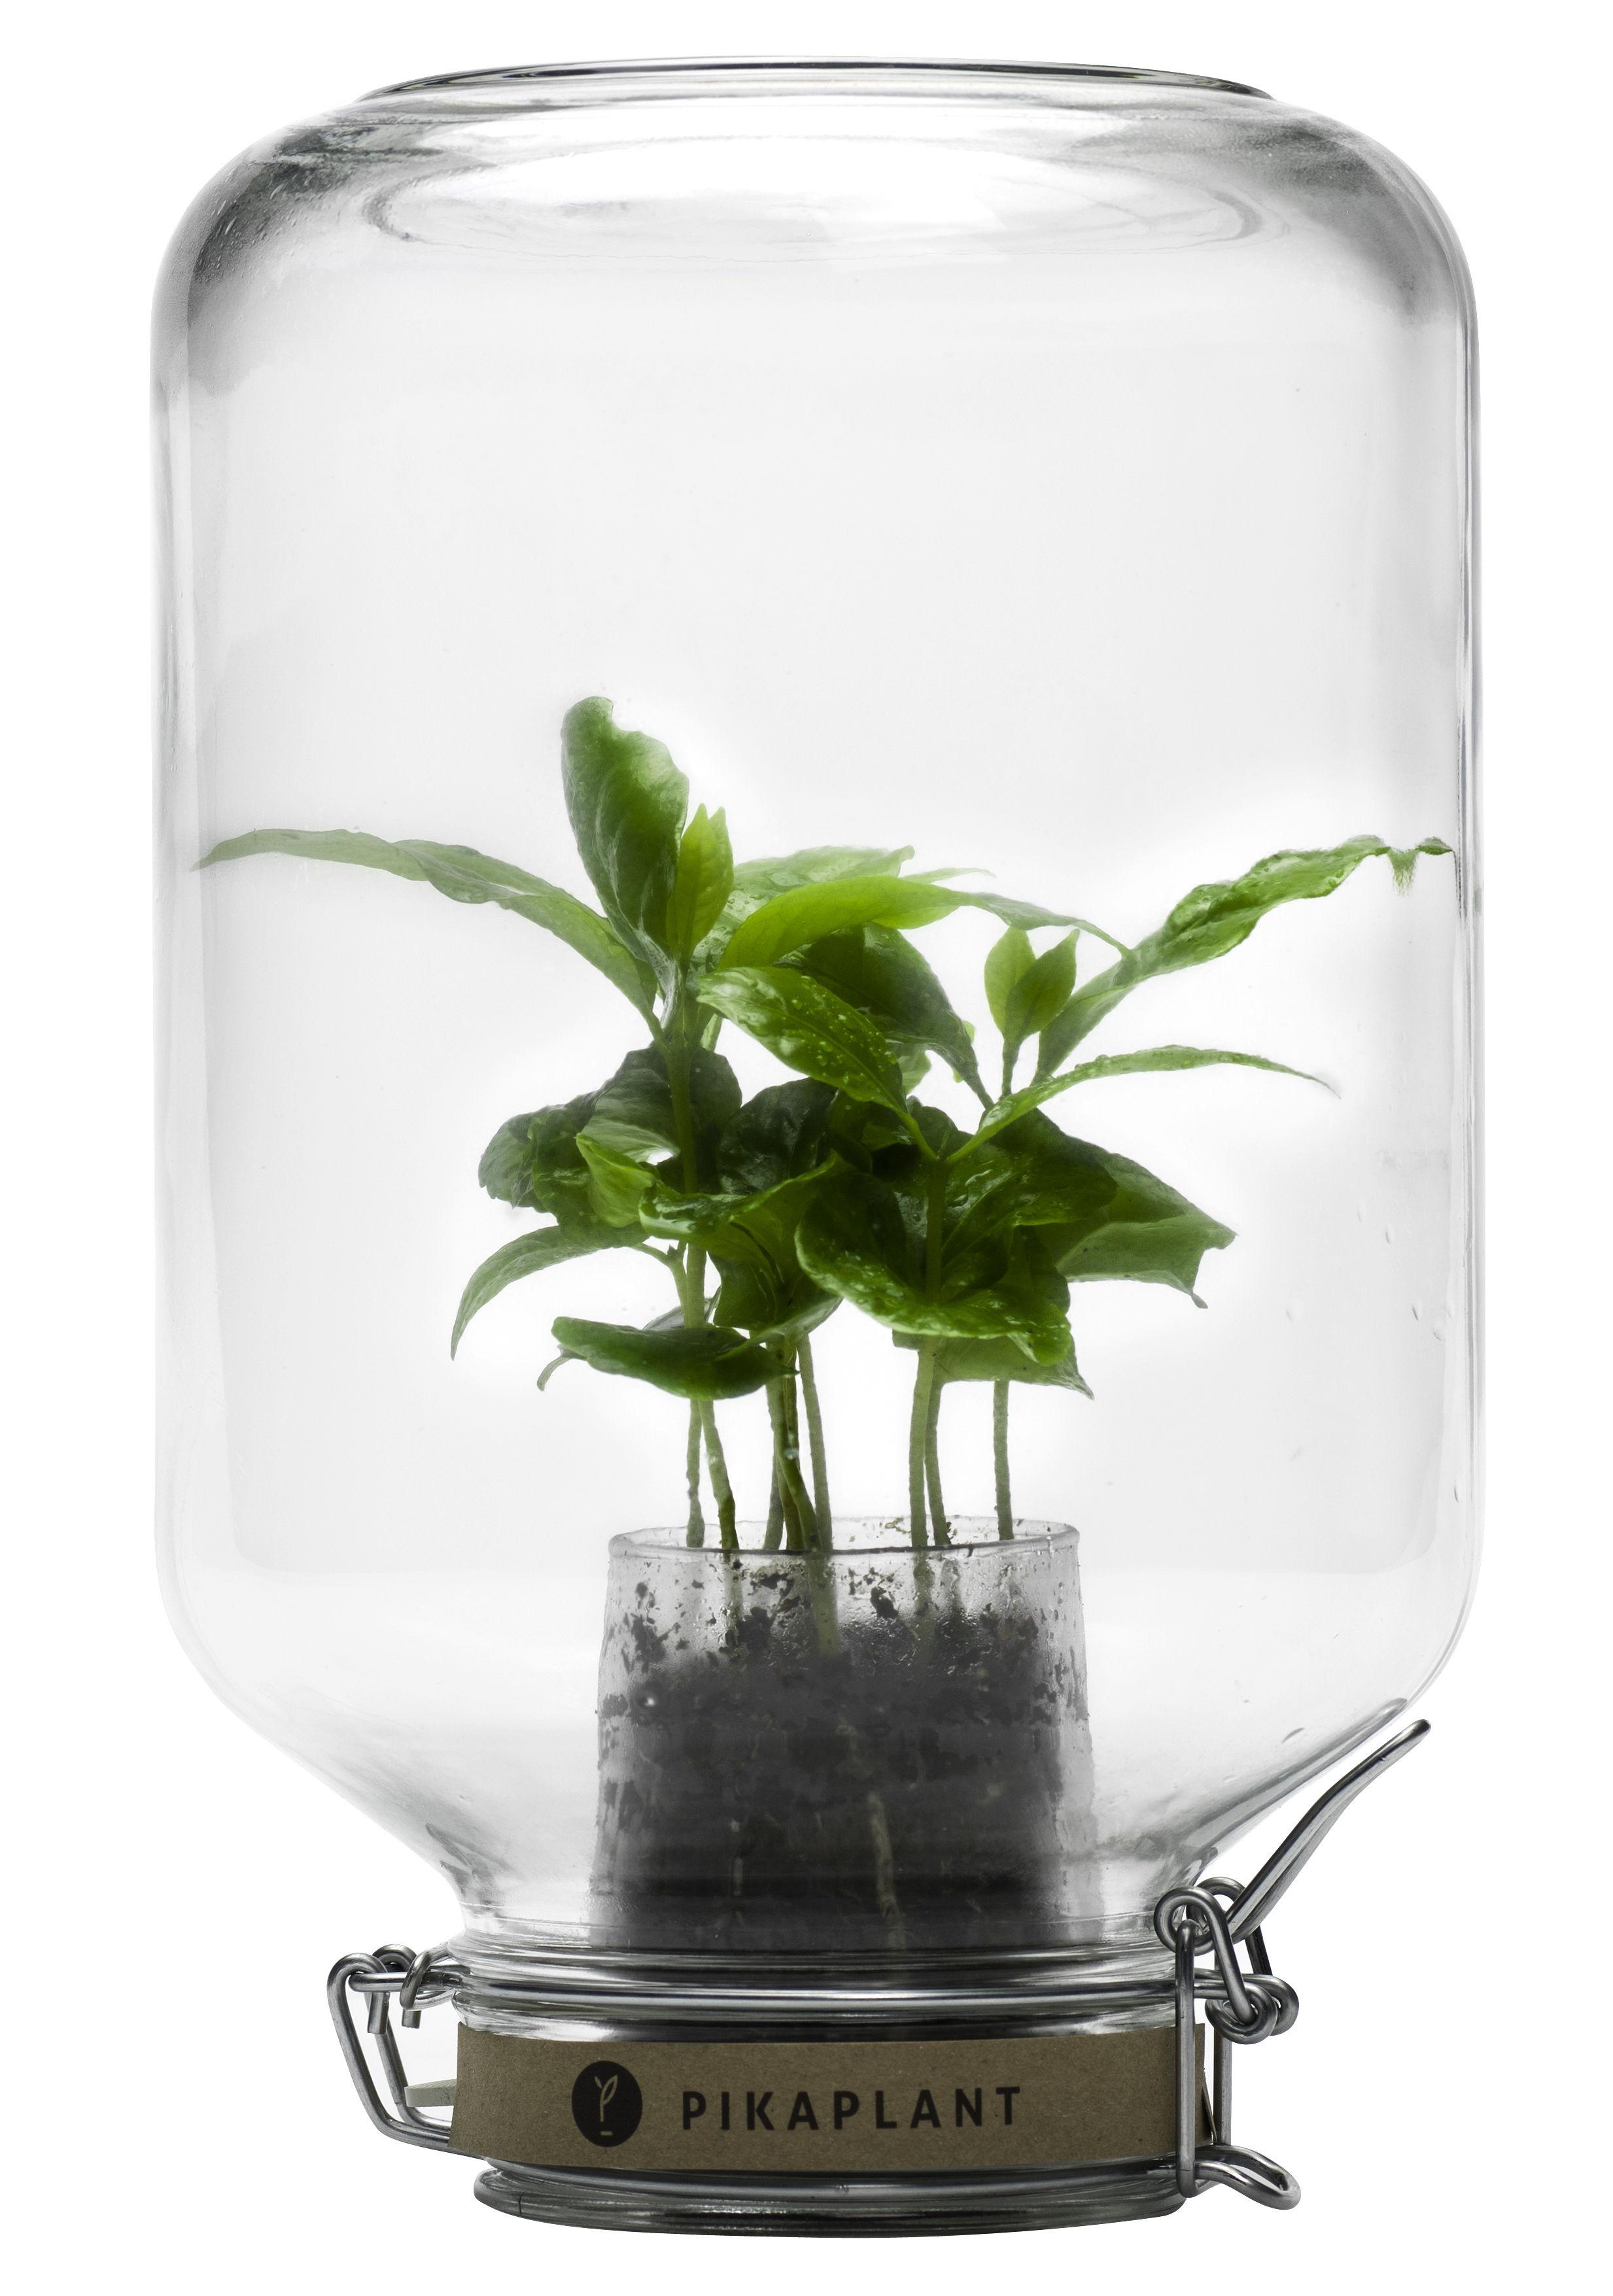 Autonomes Mini Gewachshaus Jar Von Pikaplant Transparent H 28 X